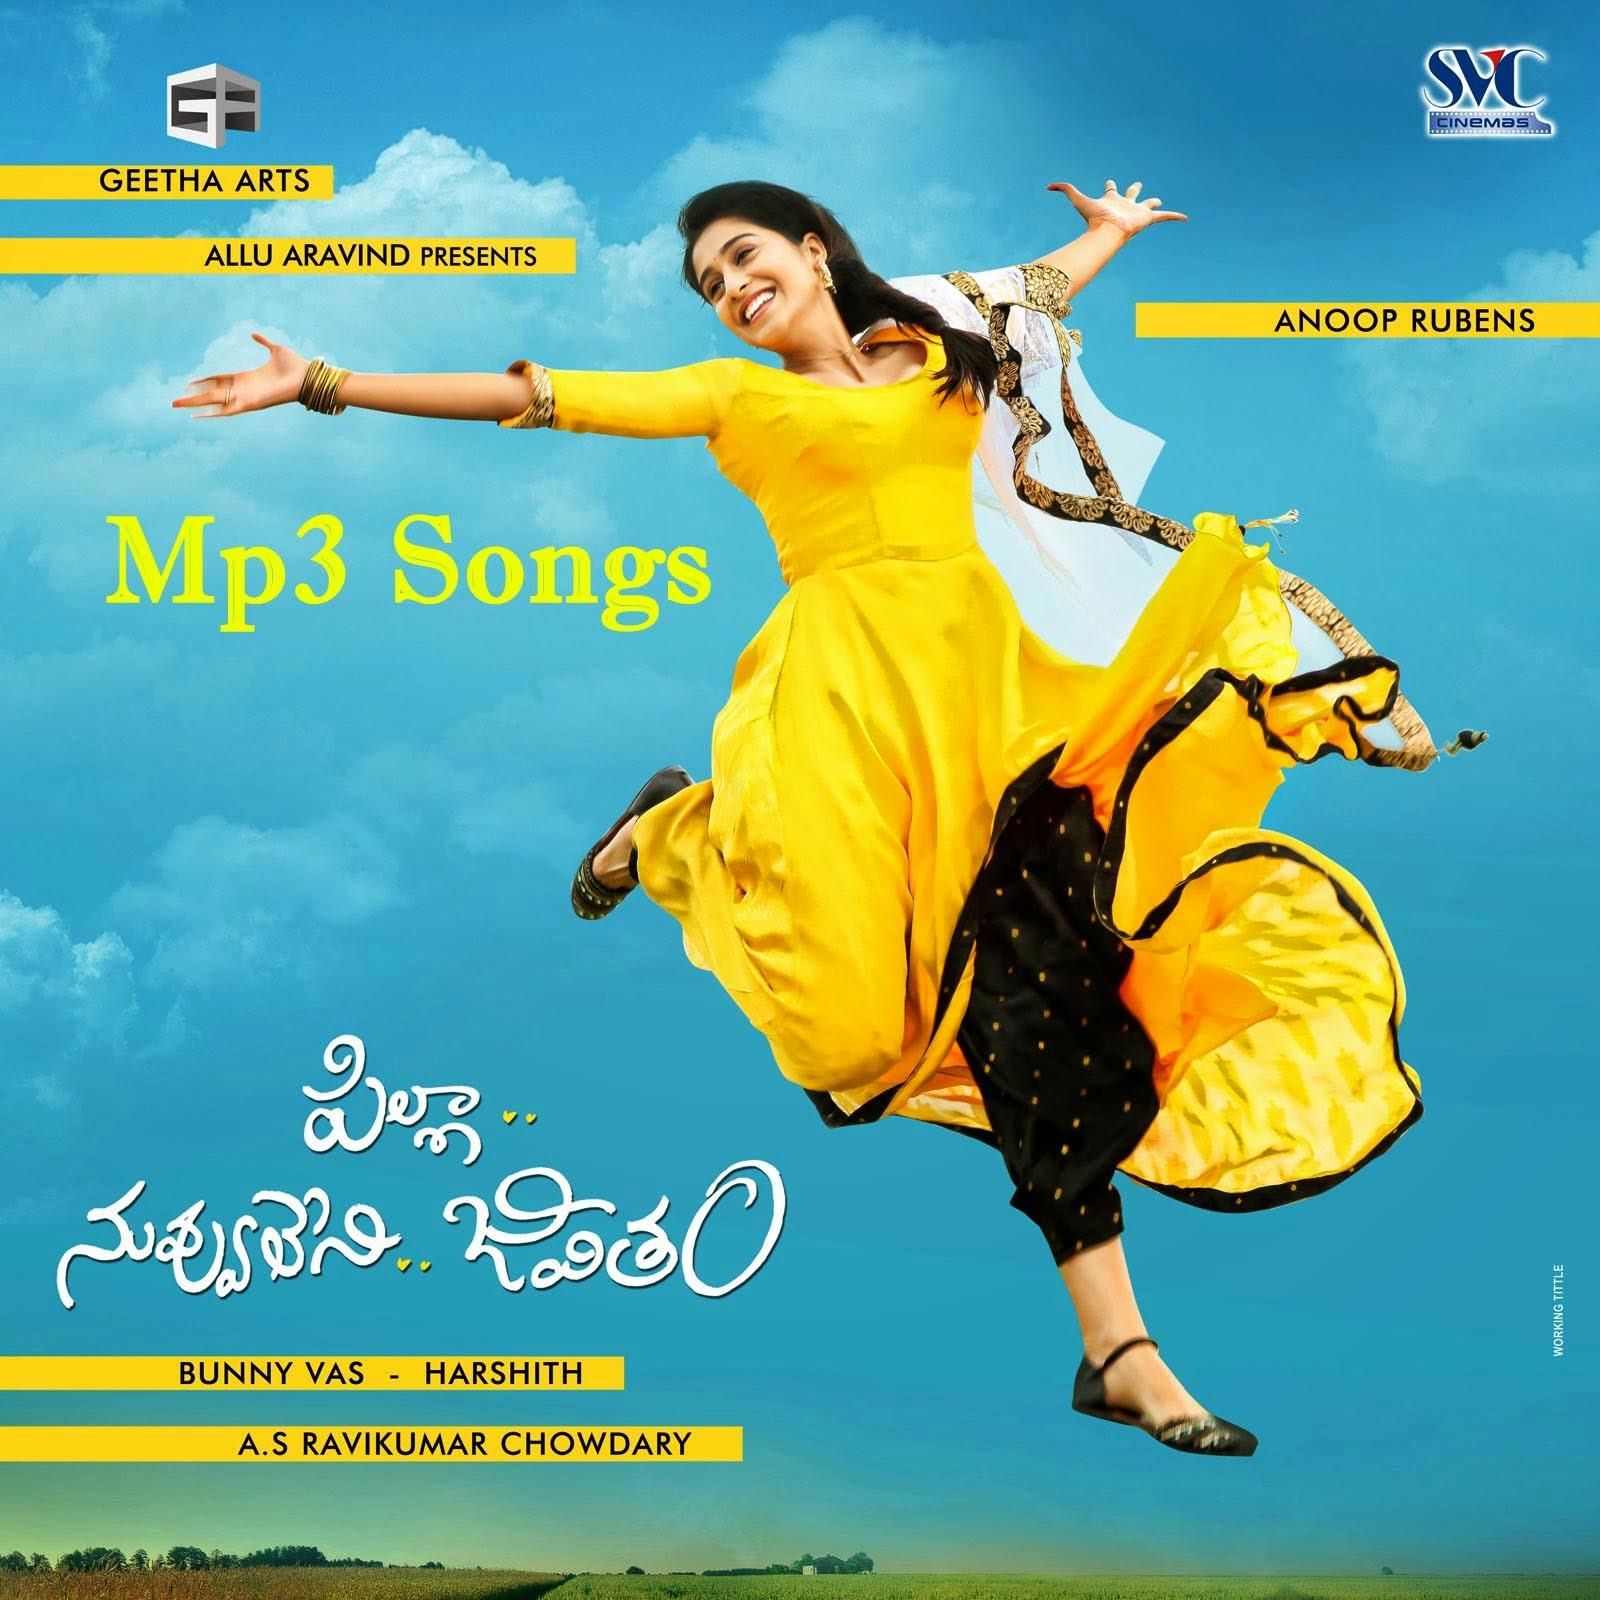 I Am A Ridar Song Dawnload Mp3: Pilla Nuvvu Leni Jeevitham (2014) Telugu Movie Mp3 Songs